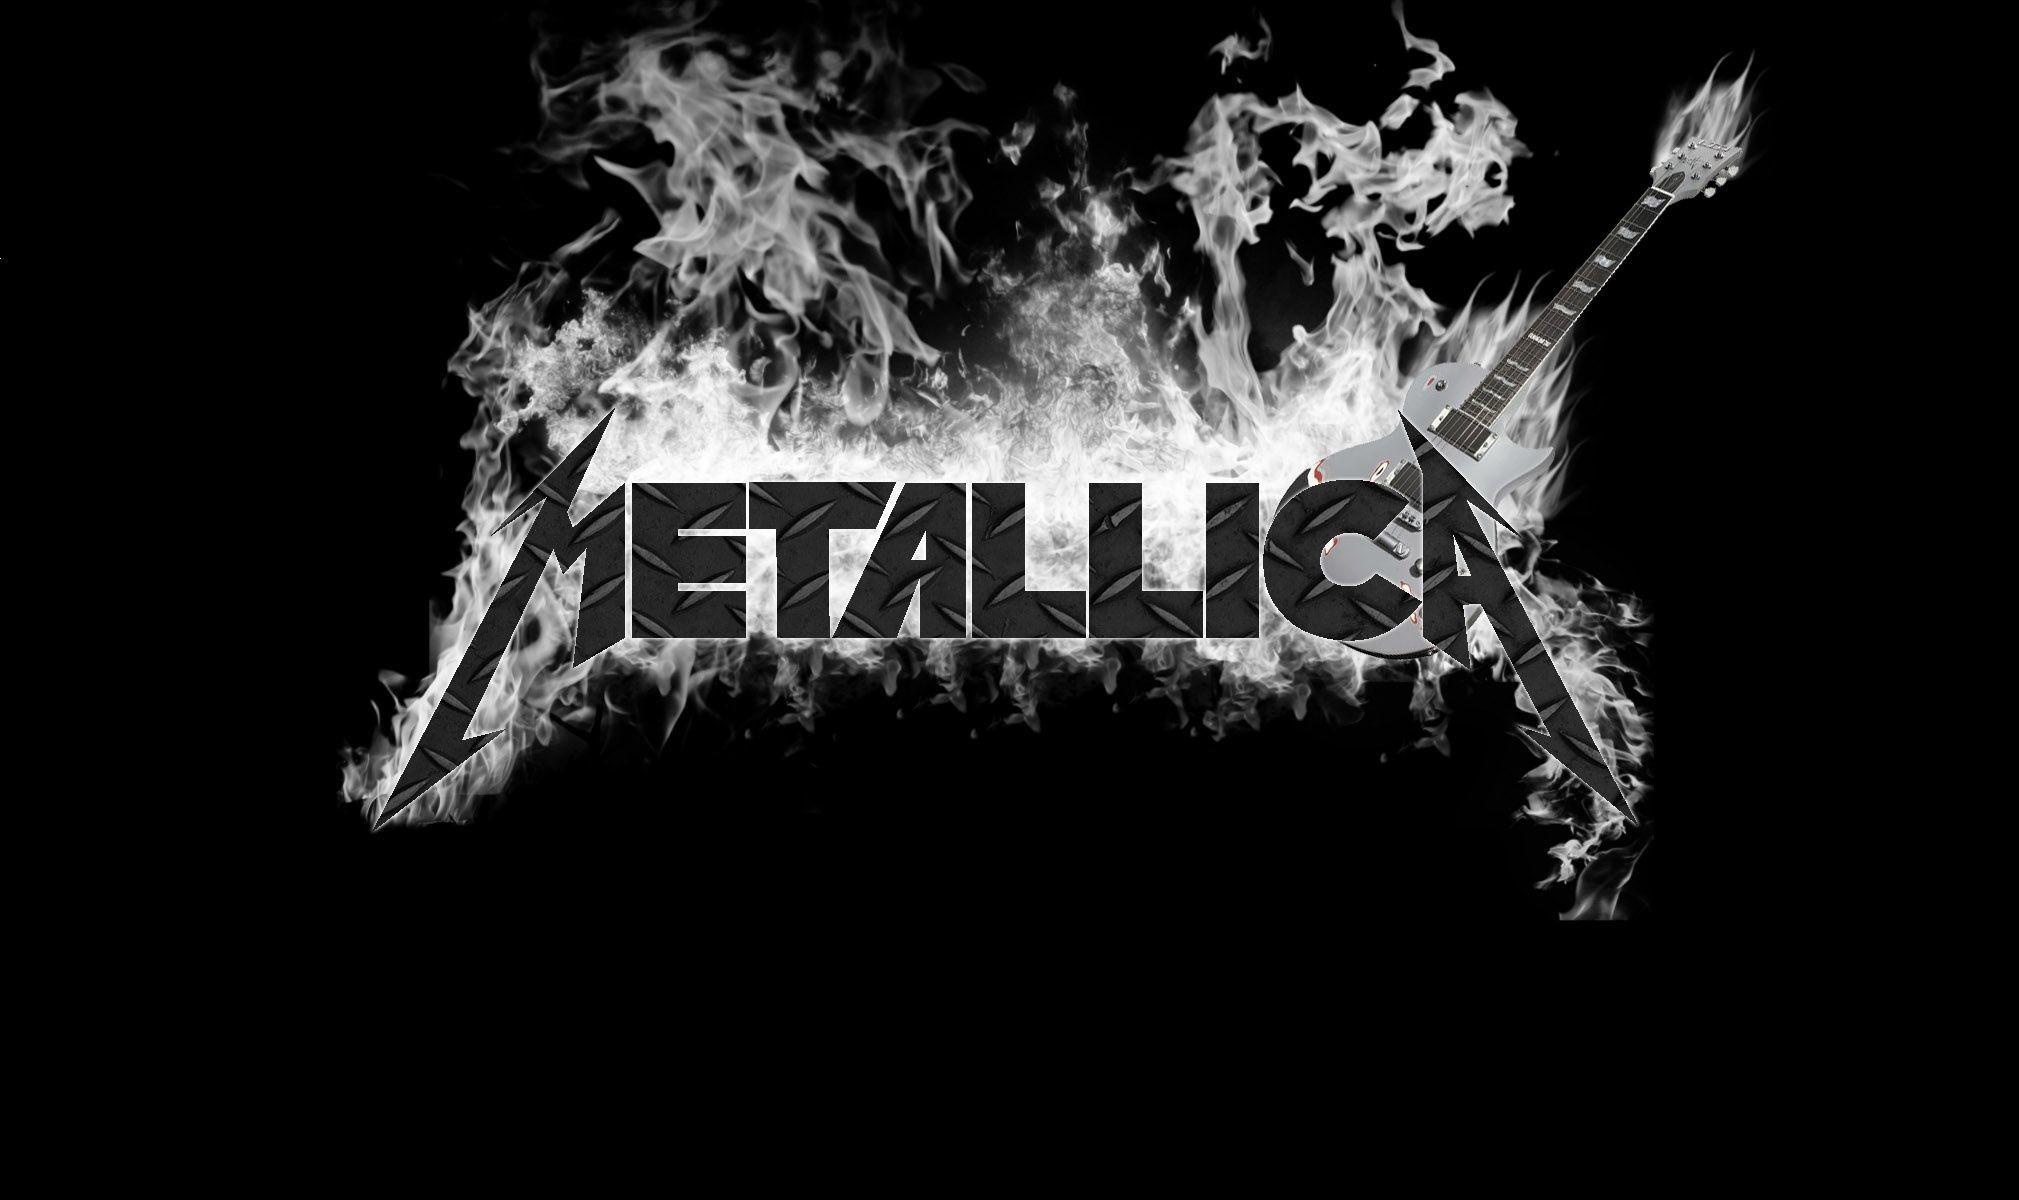 Metallica-Smoke-Logo-Wallpaper.jpg